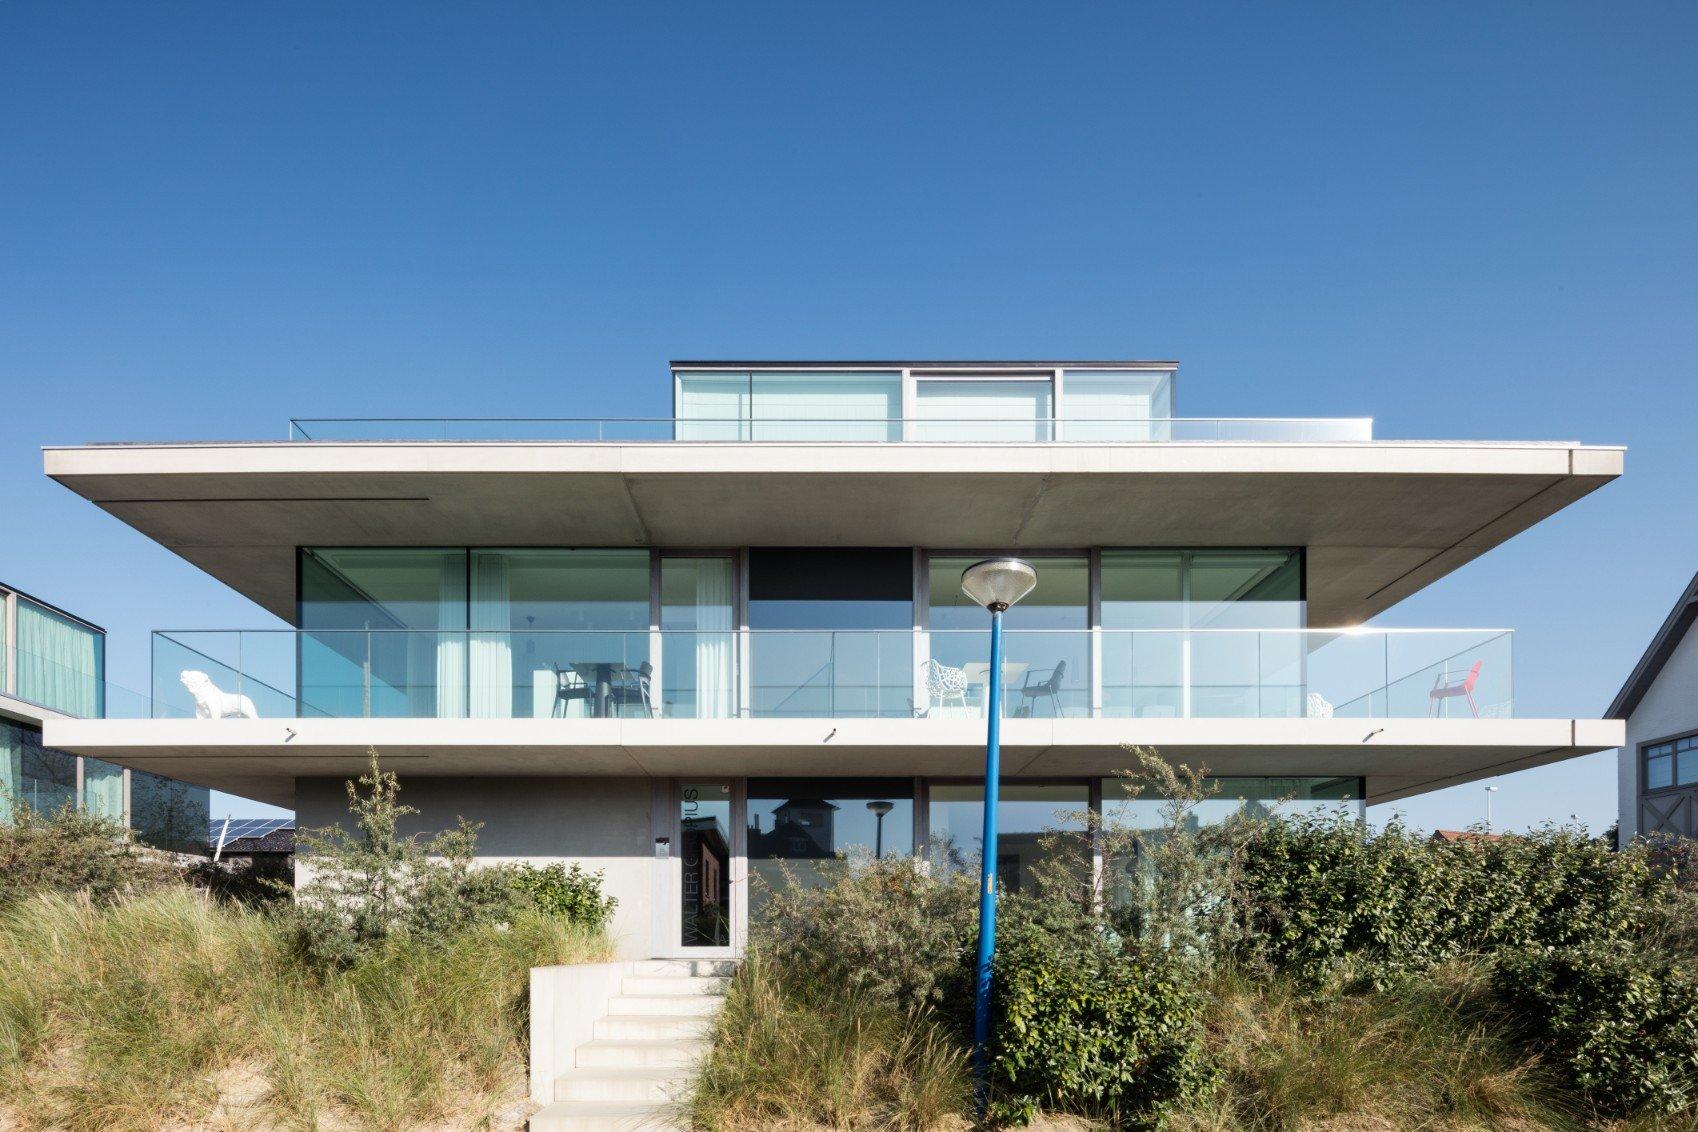 Rietveldprojects.be-Twins-Gropius-Breuer-appartement-design-architectuur-kust15.jpg